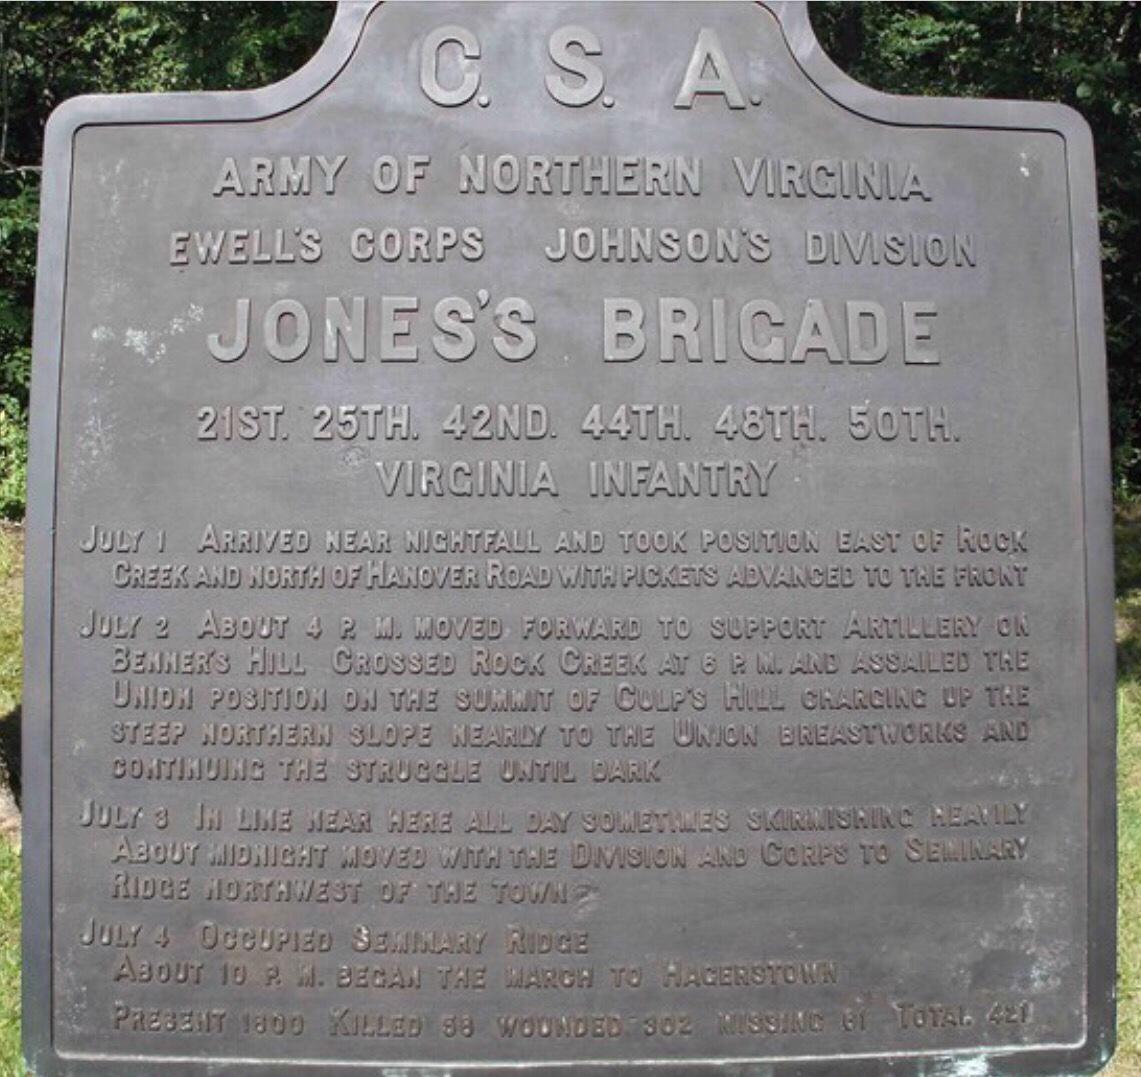 Jones Brigade Plaque, Gettysburg Pennsylvania